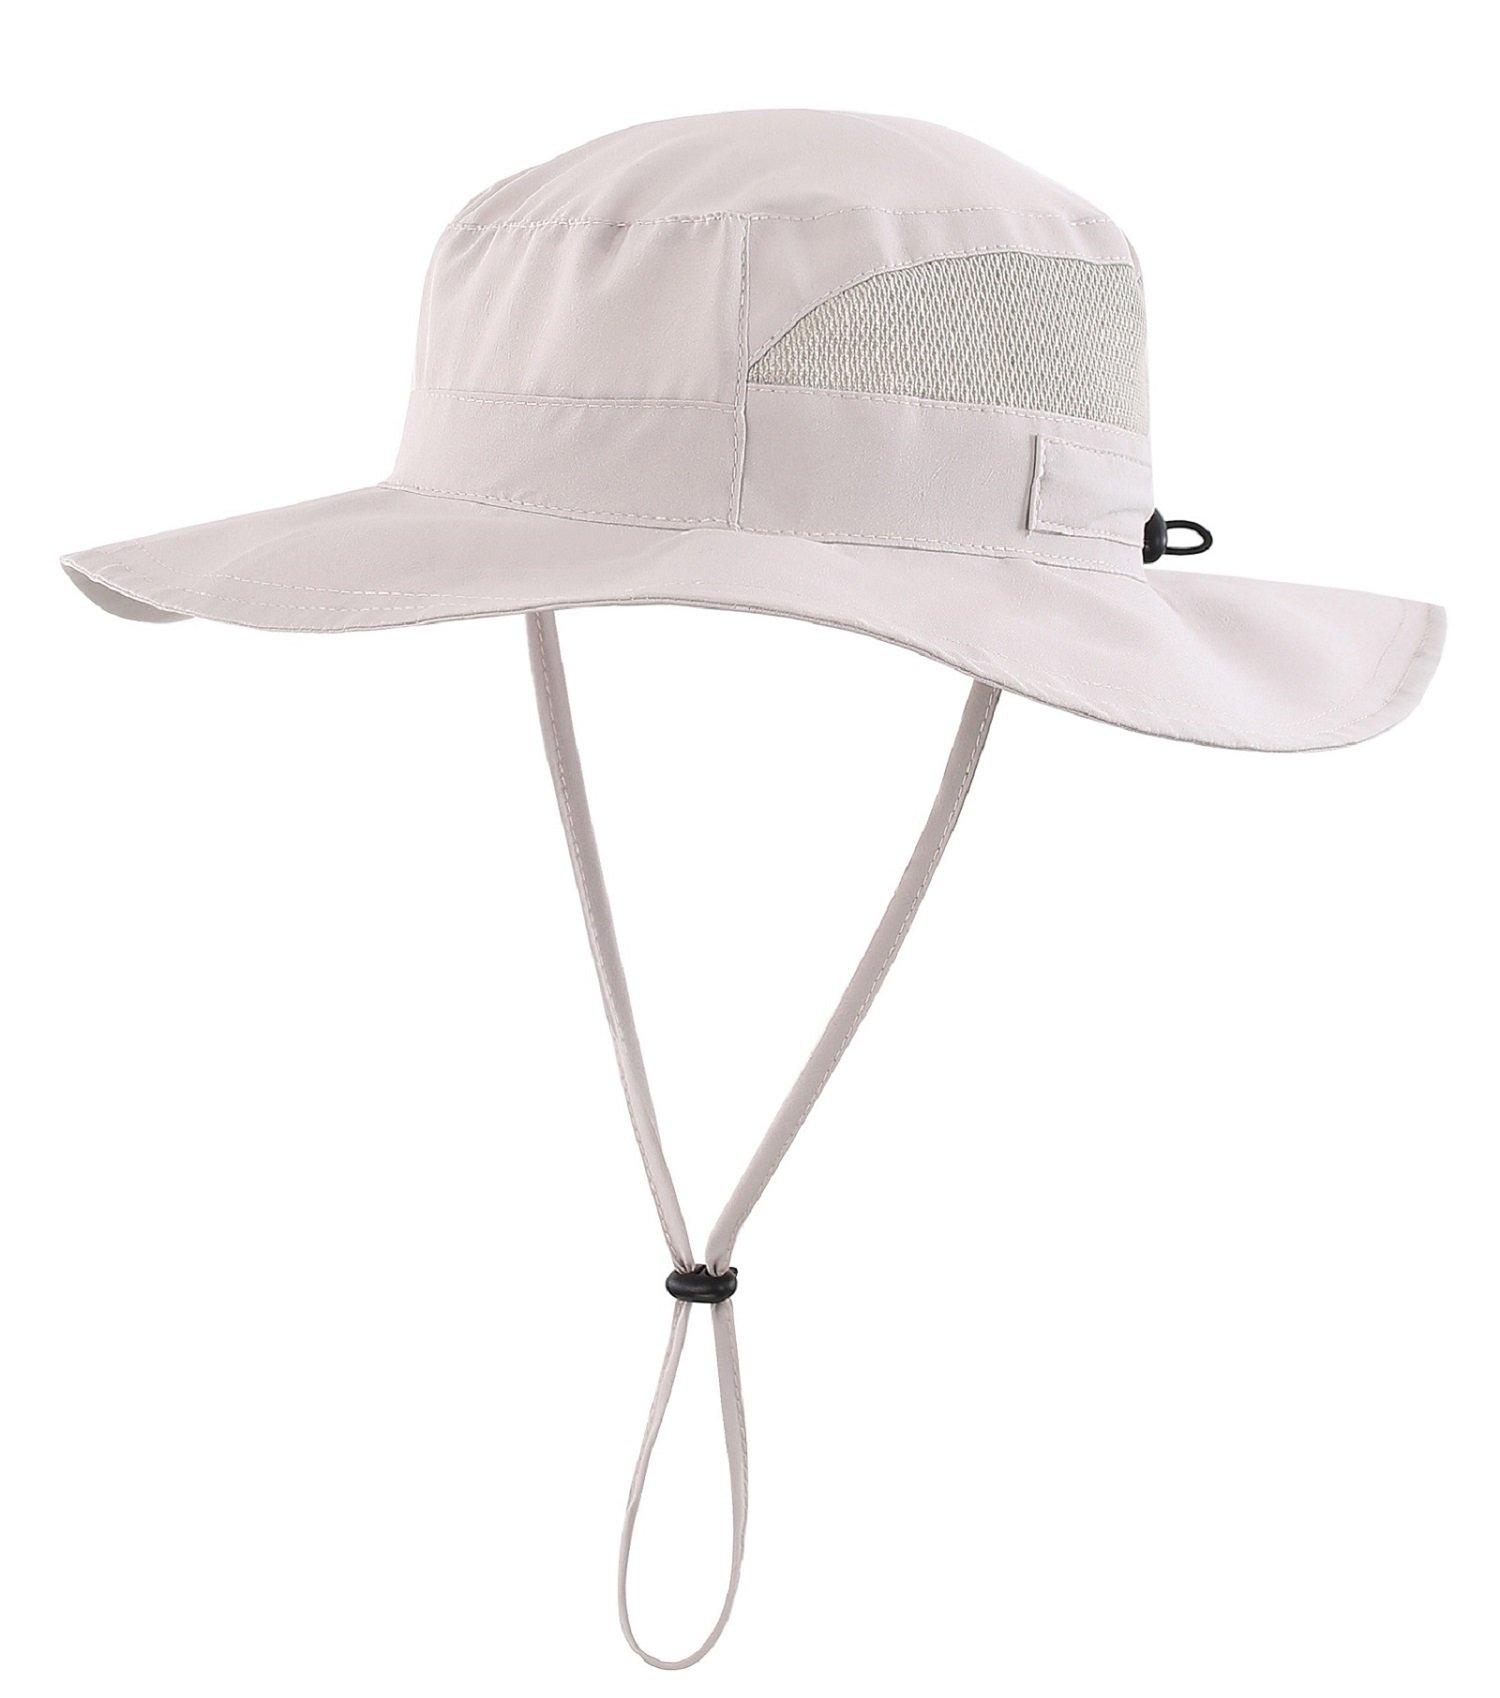 Connectyle Men's Outdoor Mesh Boonie Sun Hat Summer Wide Brim UV Protection Fishing Hat Safari Cap